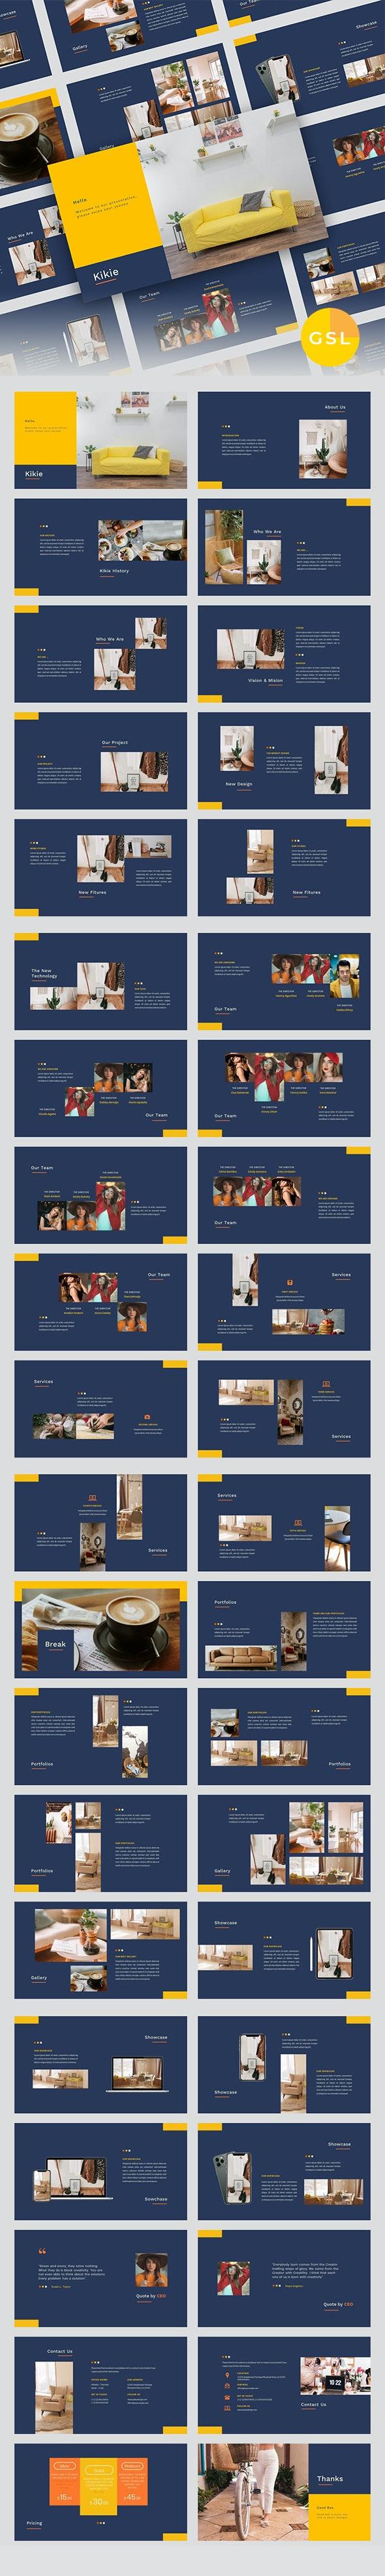 Kikie – Creative Business & Elegant Google Slides Template - Google Slides Presentation Templates